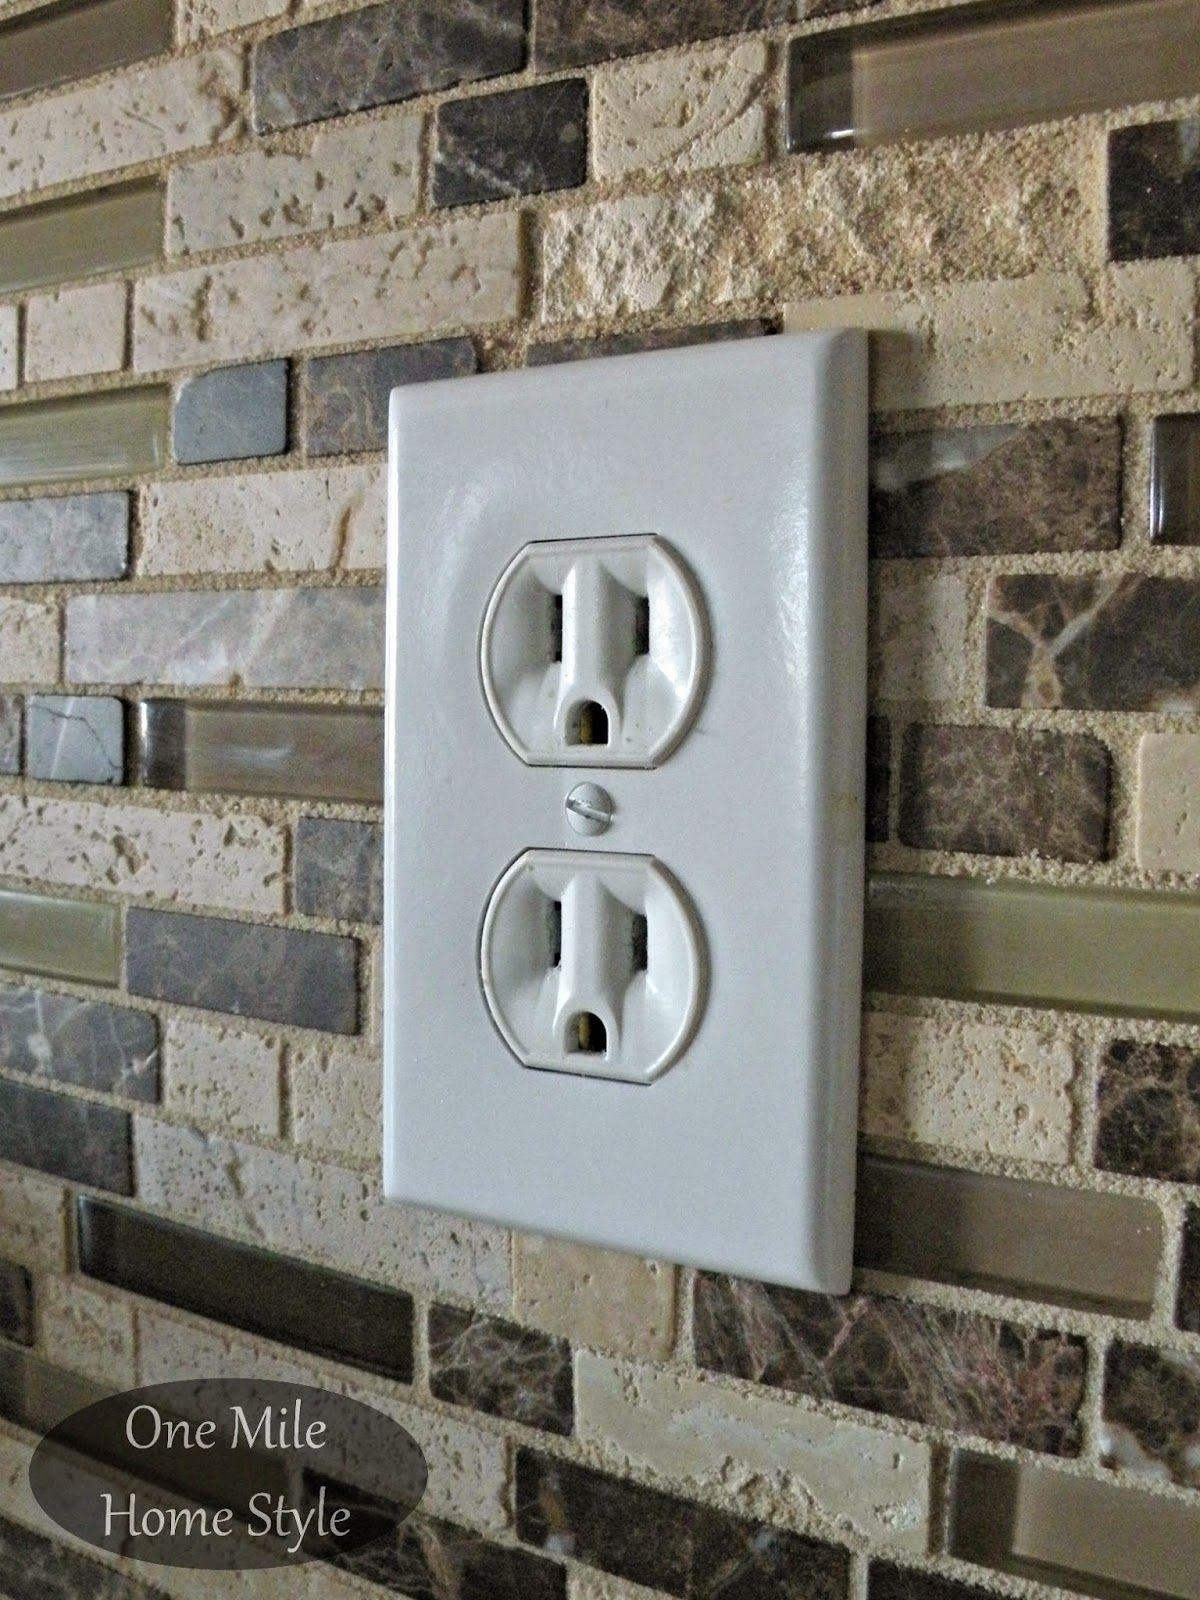 hight resolution of adjusting electrical outlets after tiling electrical outlets electrical wiring diy home repair home